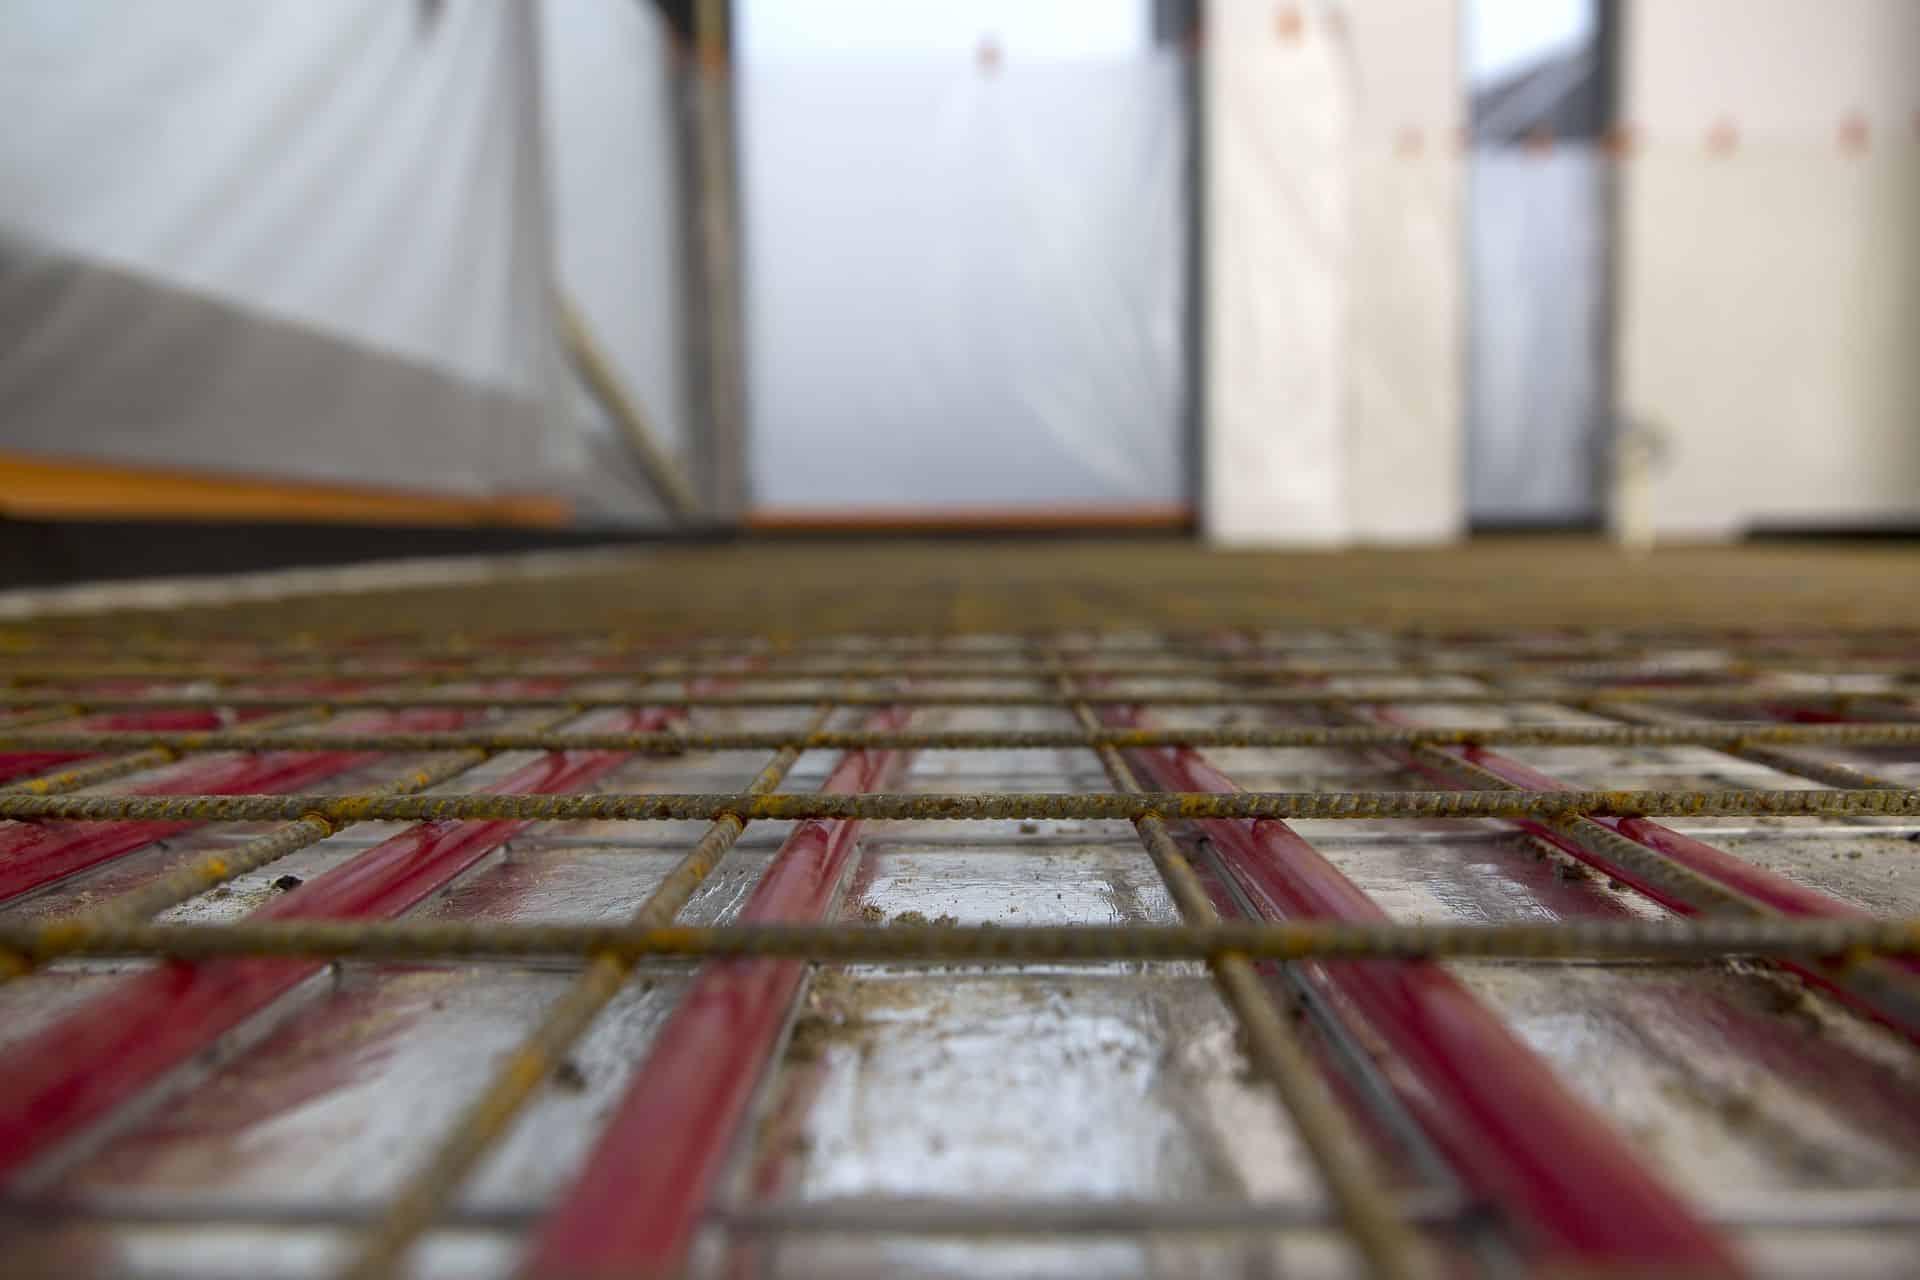 betonvloer storten op zand, woonbeton vloerverwarming, wapening betonvloer, woonbeton vloerverwarming